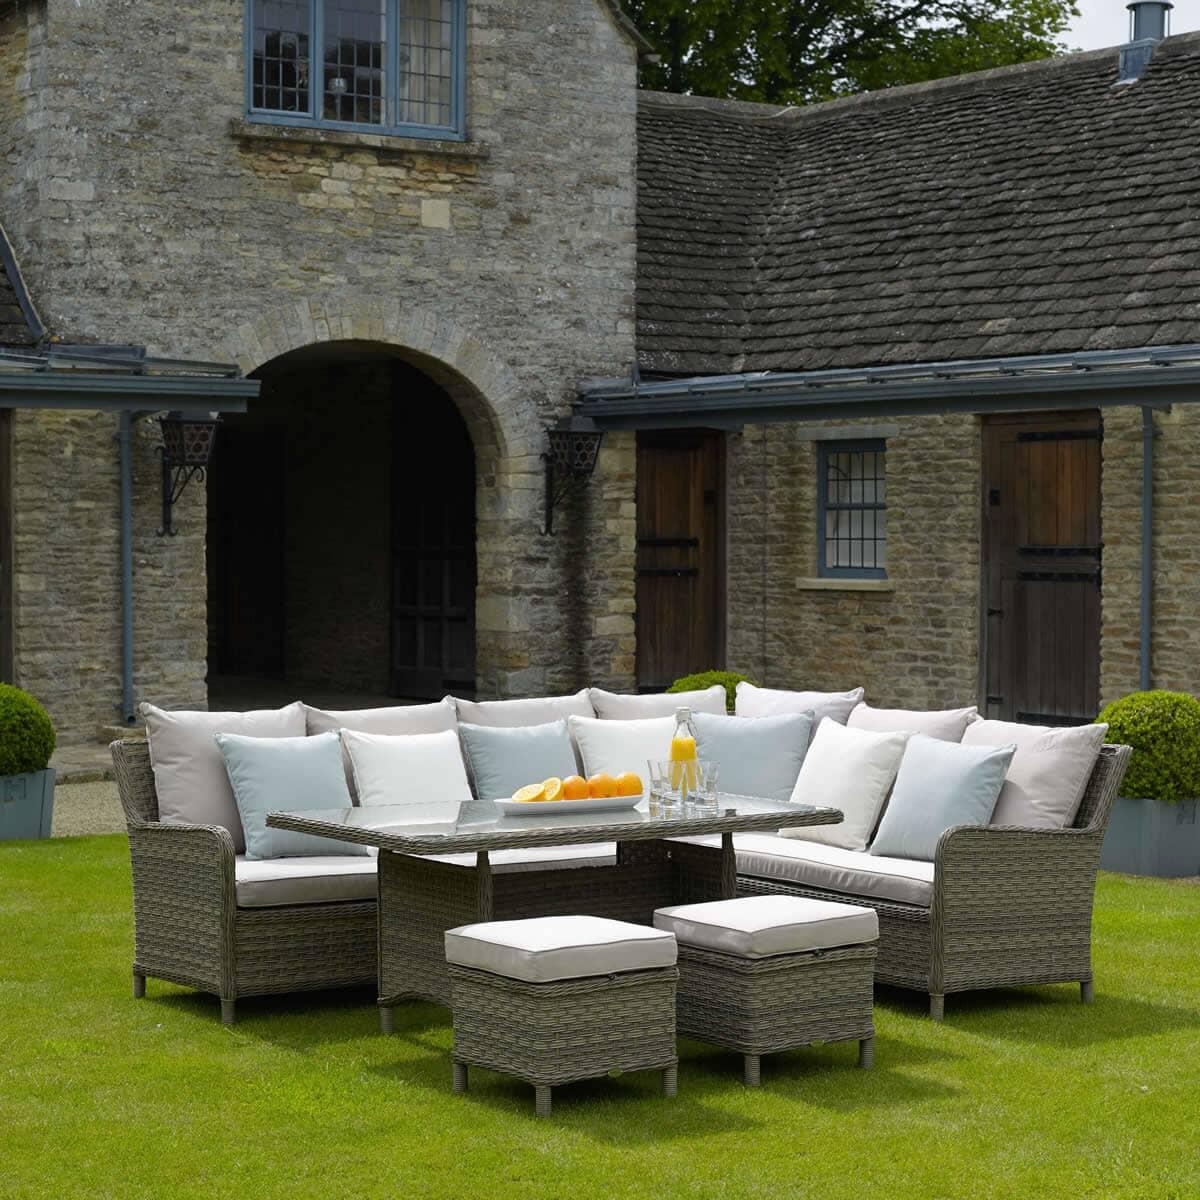 bramblecrest patagonia modular sofa casual dining set. Black Bedroom Furniture Sets. Home Design Ideas